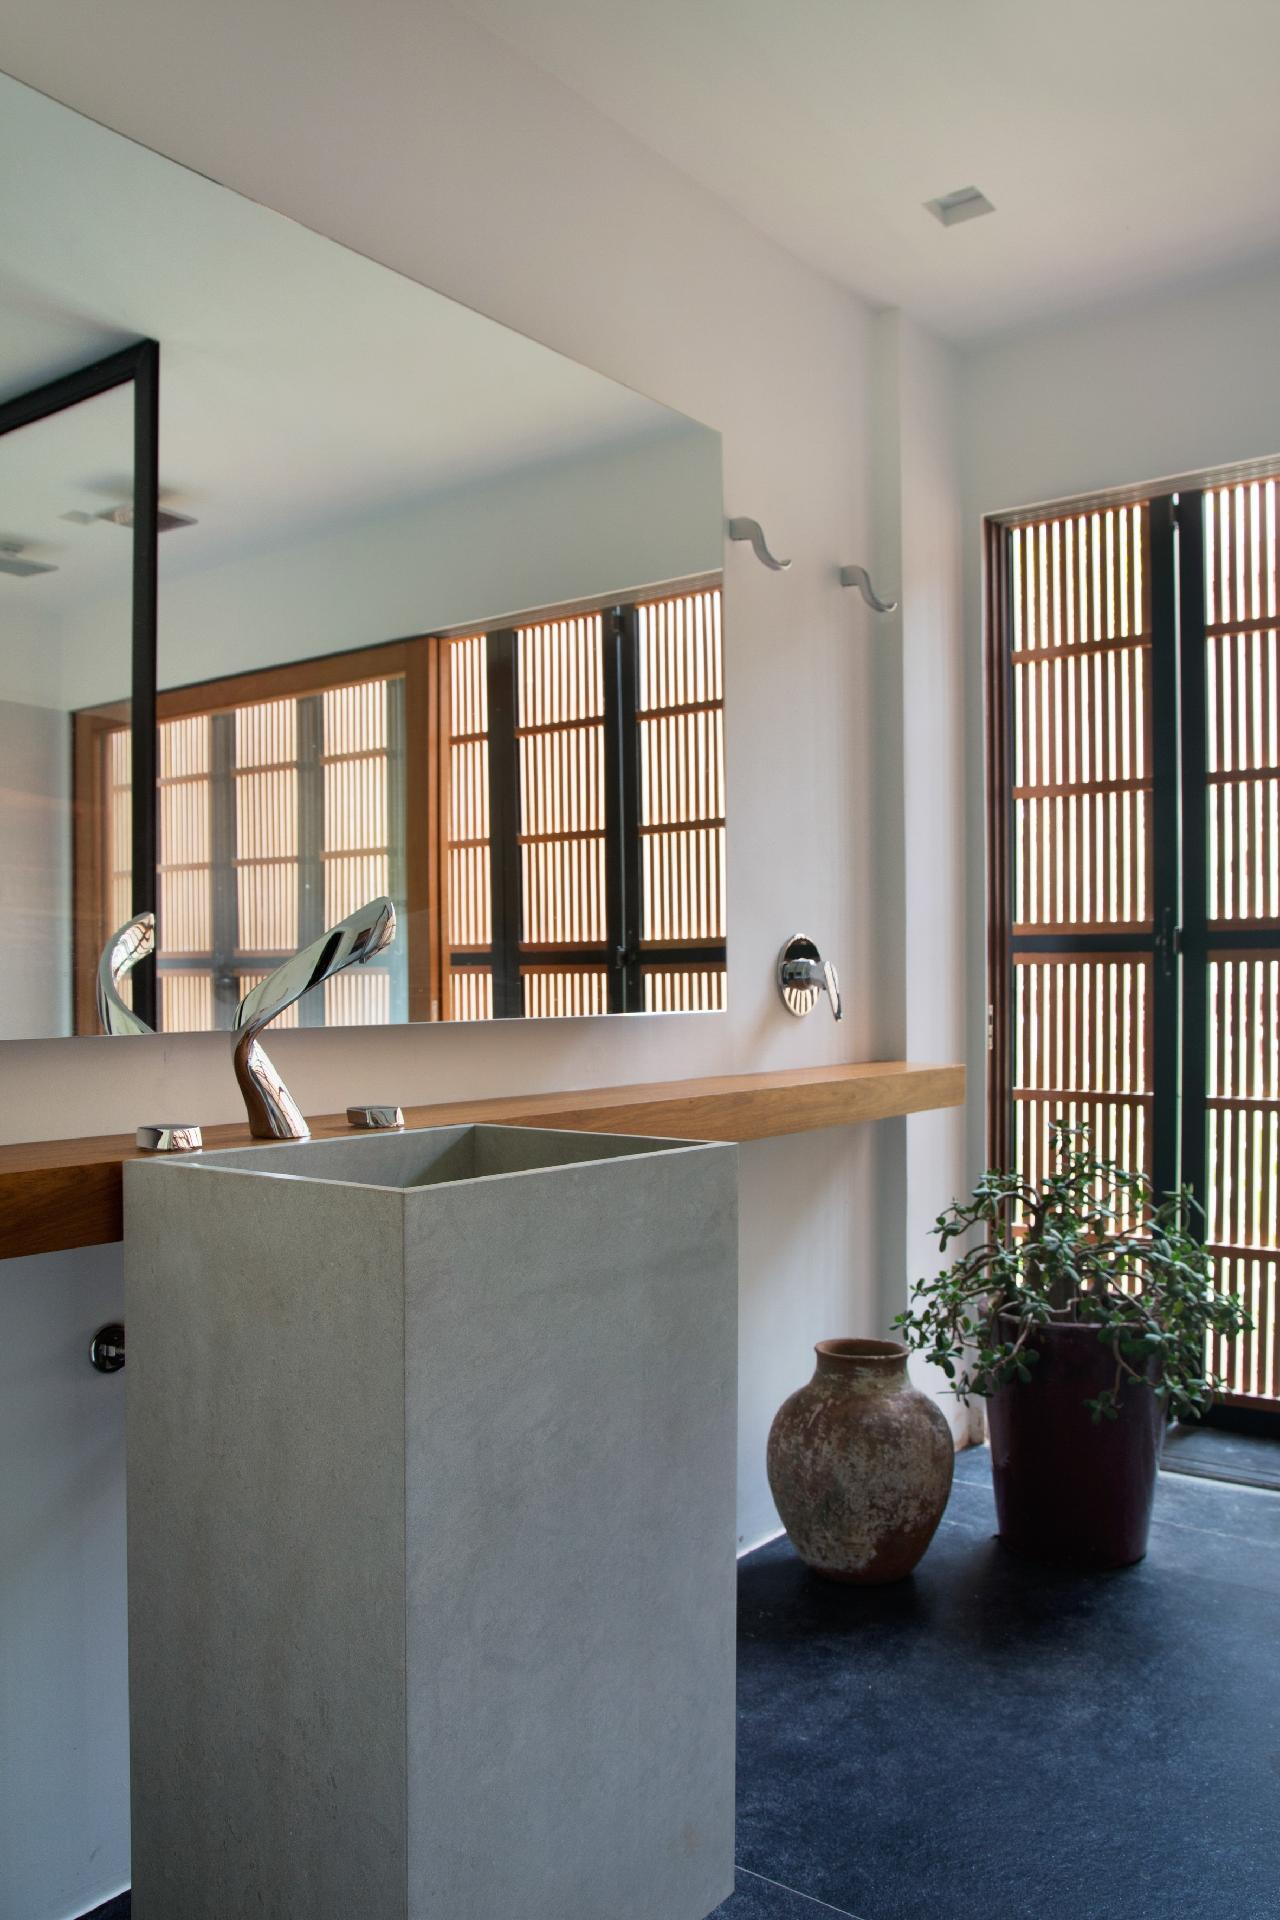 Cuba para Banheiro Tipos, Modelos e 60 Fotos Incríveis! -> Cuba Para Banheiro No Df